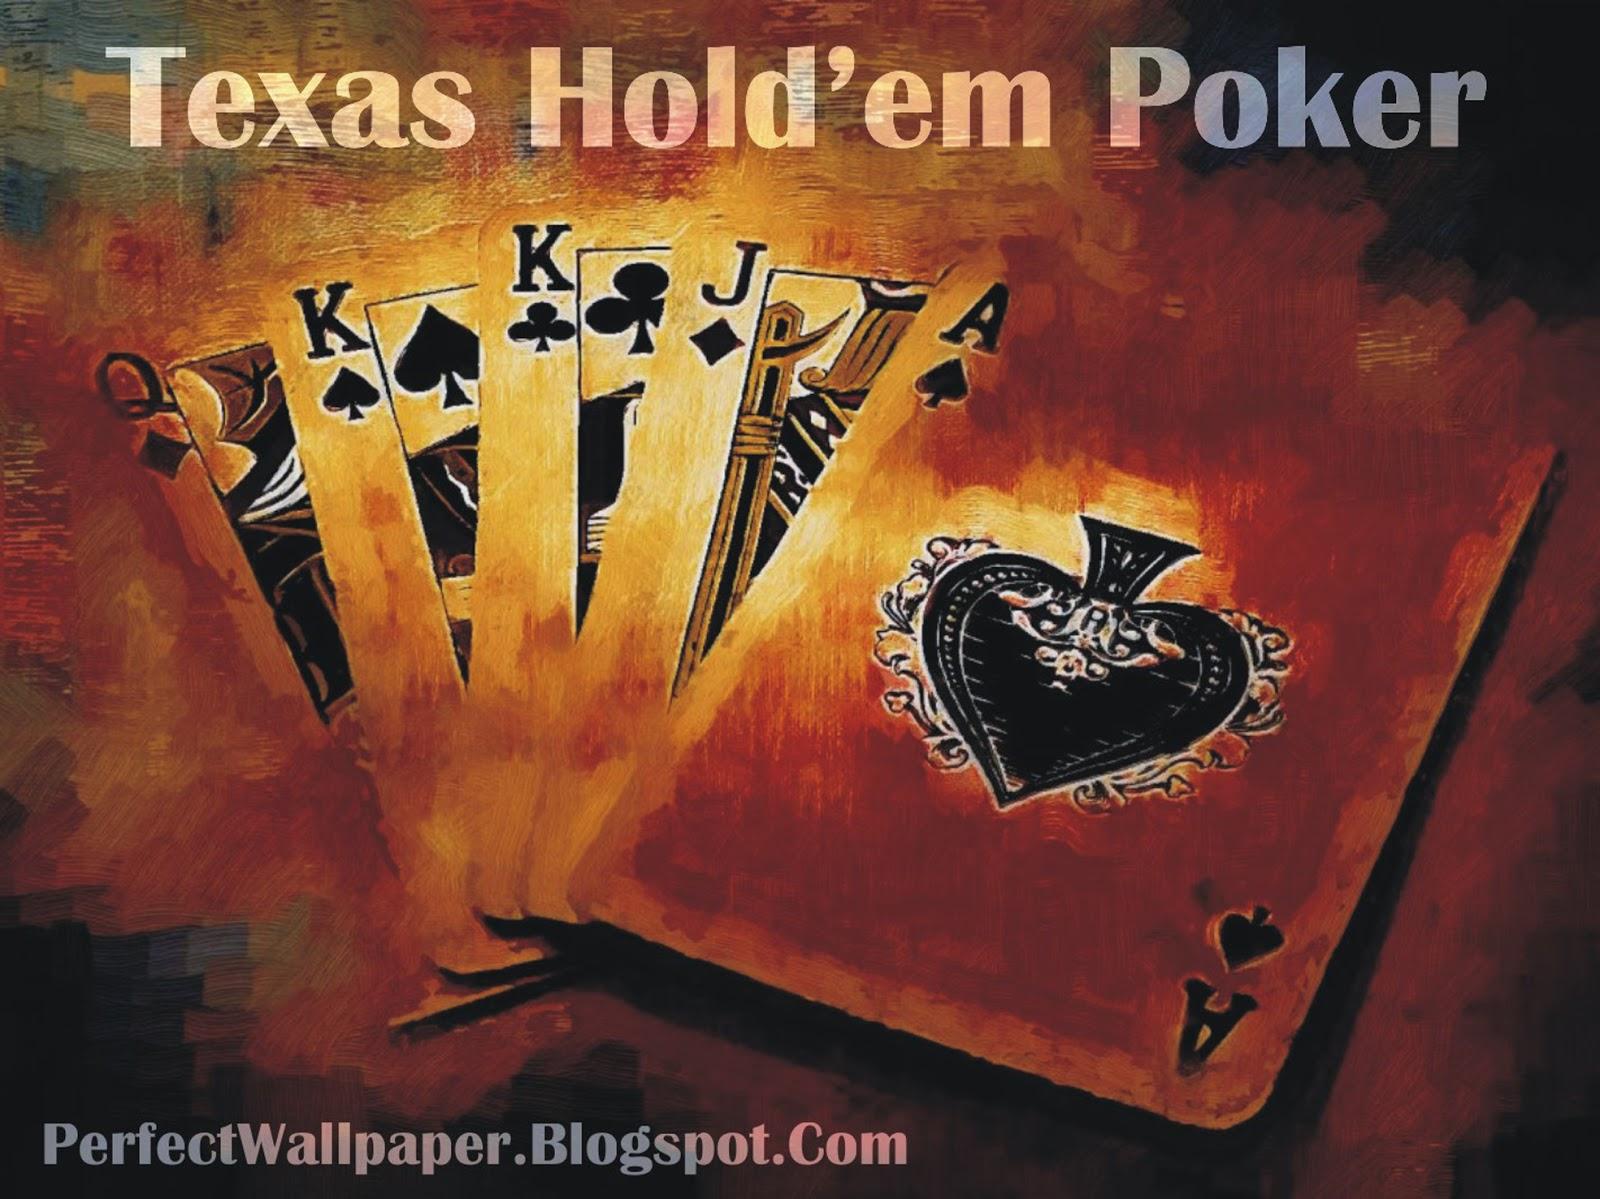 ... texas hold em poker pictures texas hold em poker images texas hold em